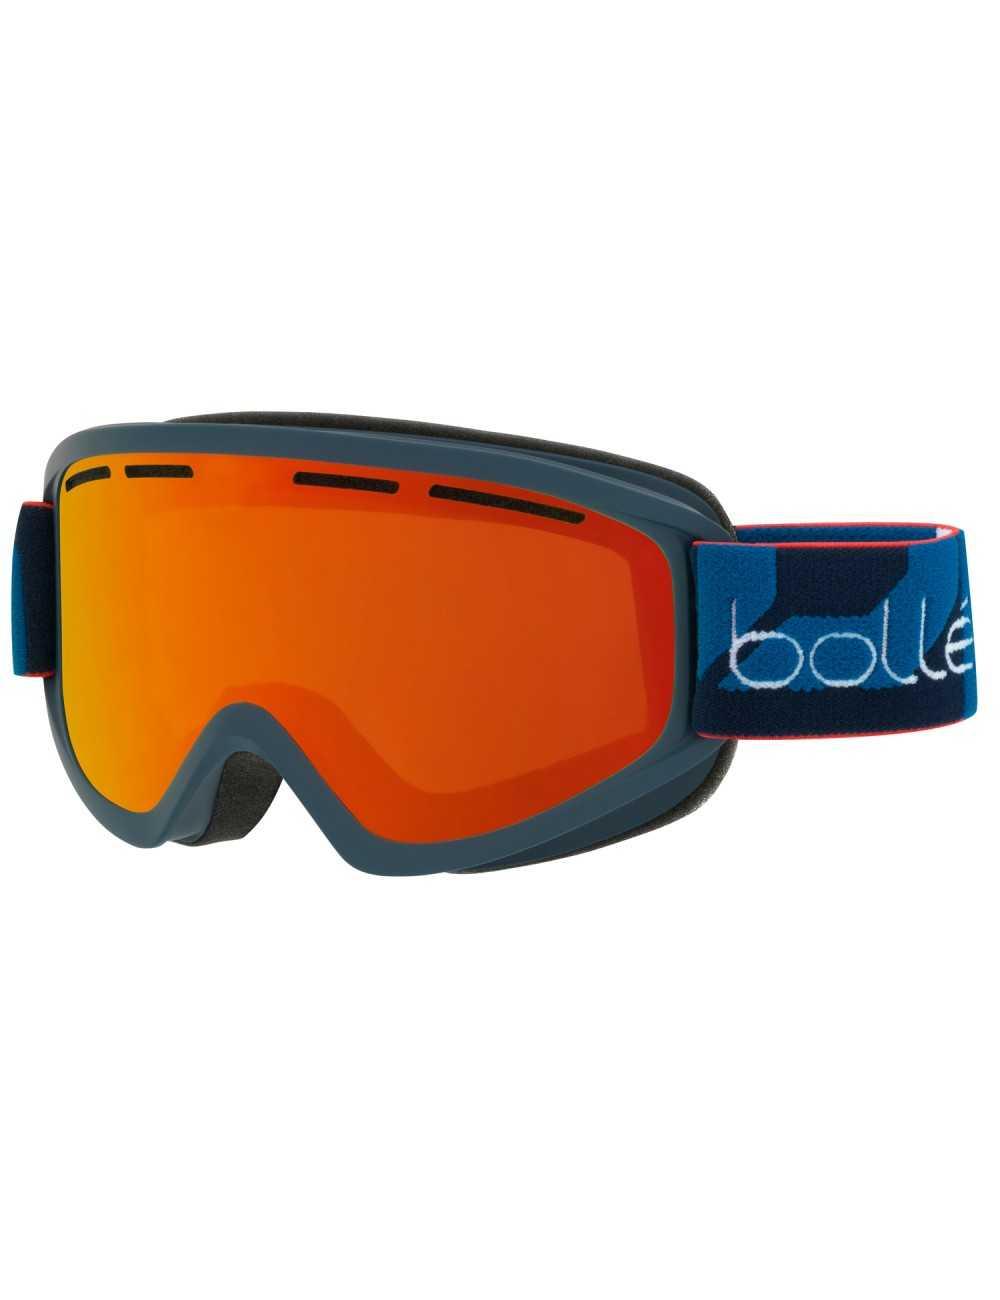 Bolle Goggle 21873 Schuss